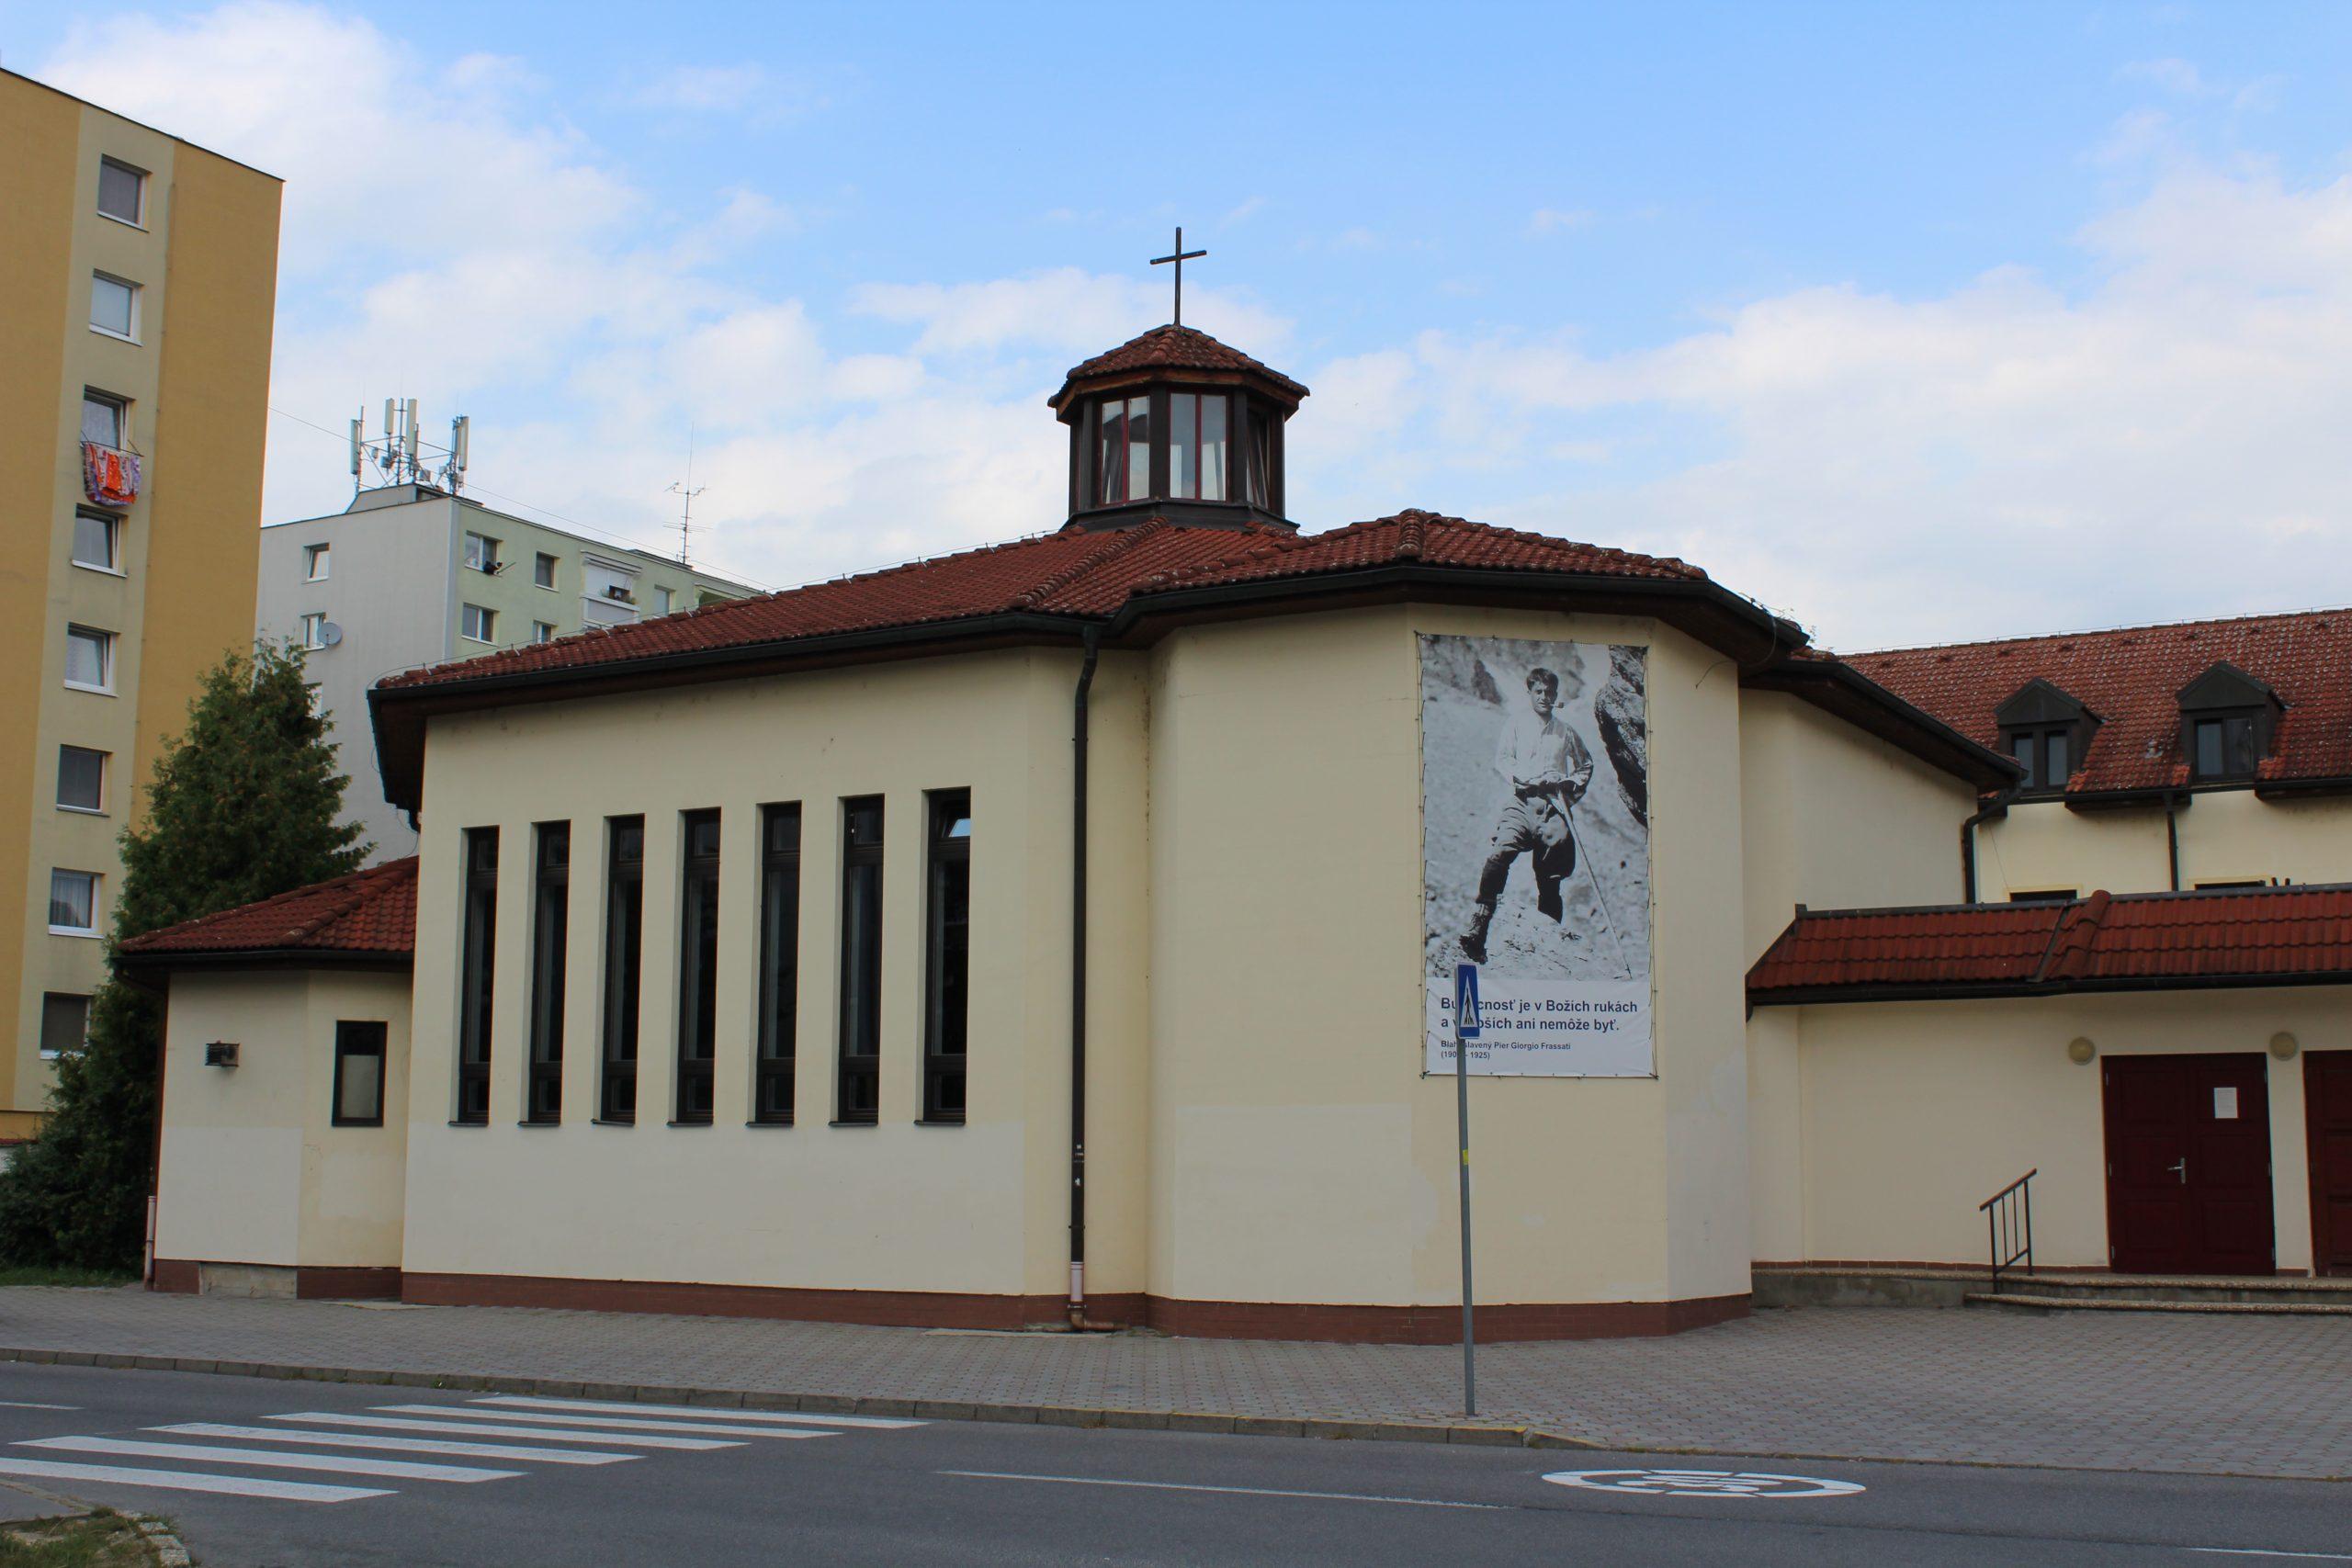 Kostol Sv. Dominika Zvolen-Západ